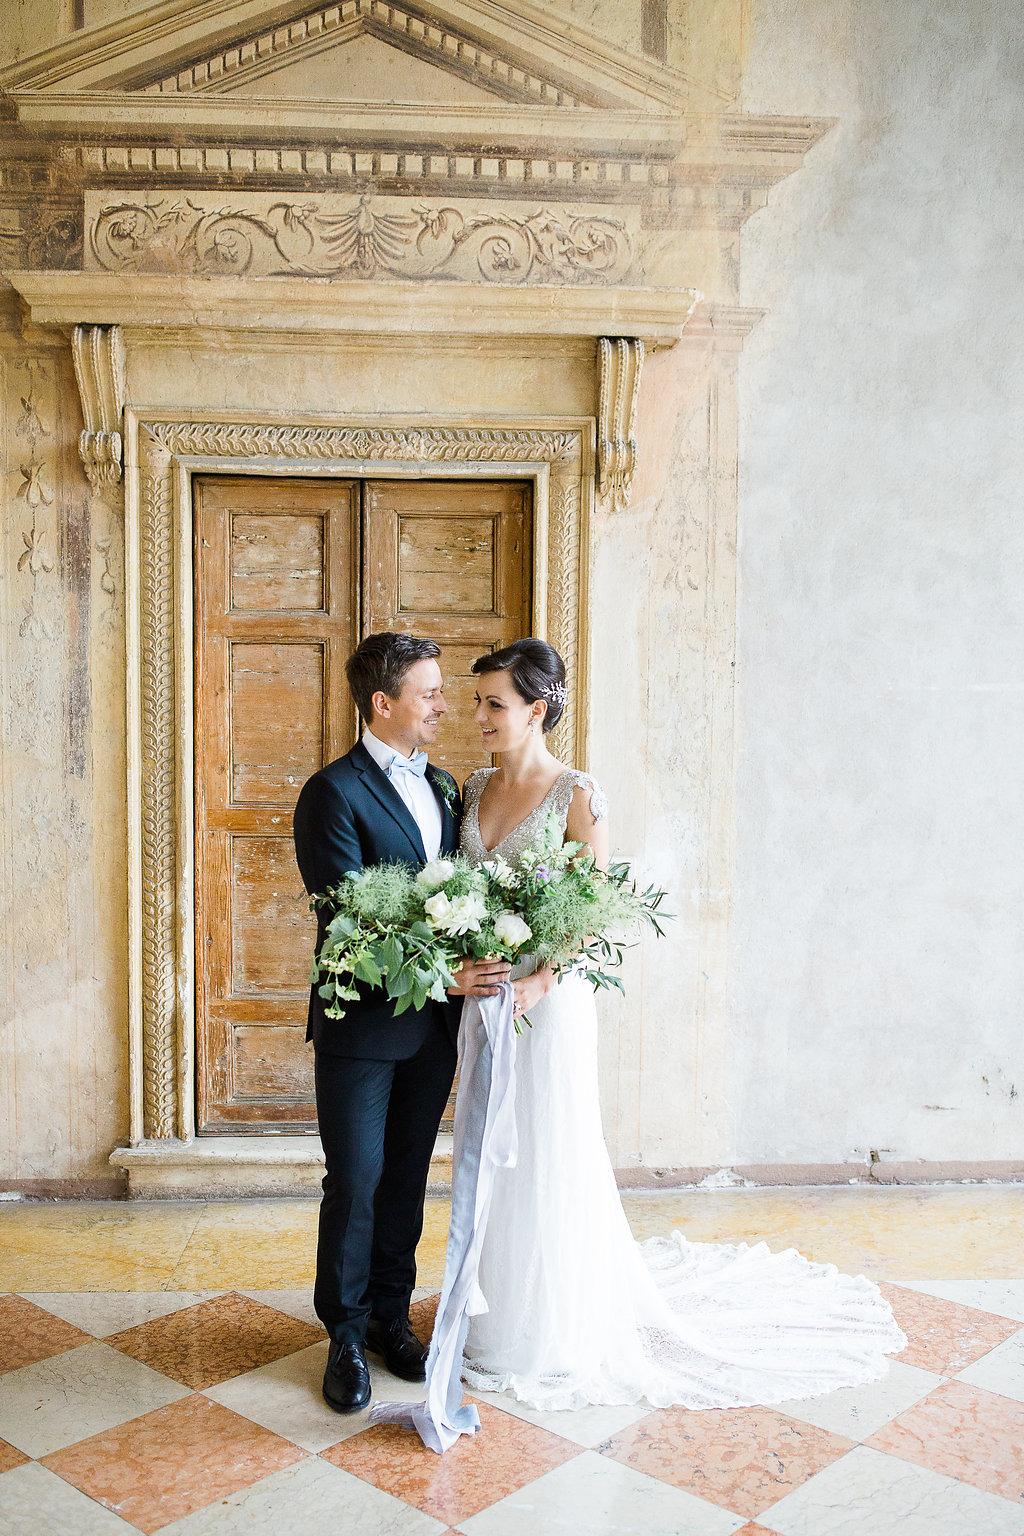 Verona-Destination-Wedding-Inspiration-by-Kibogo-Photography6.jpg